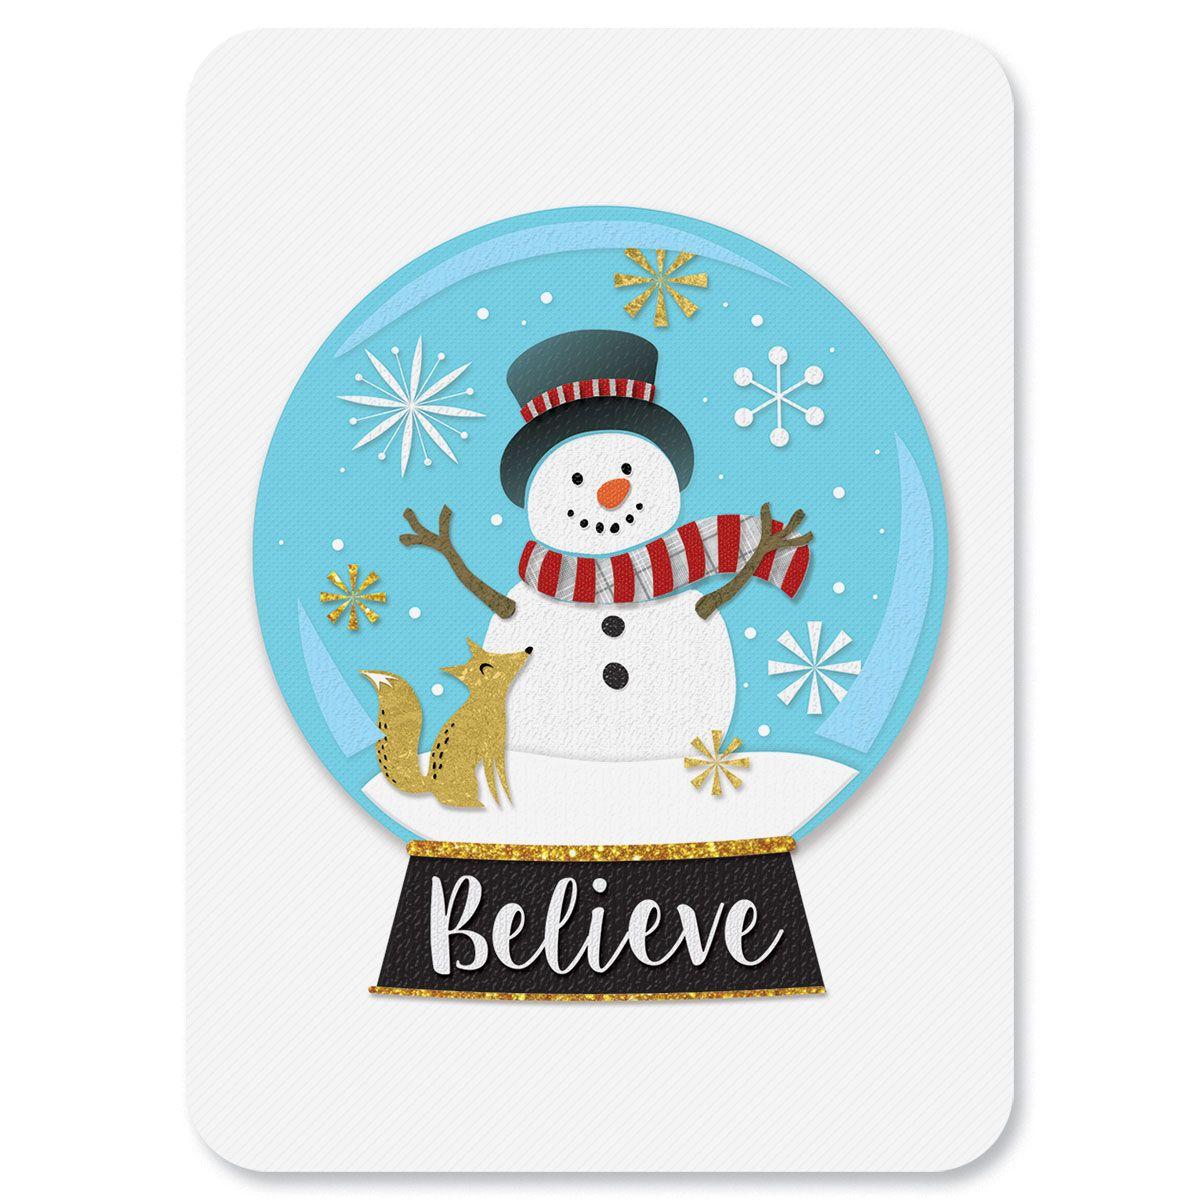 Snowglobe Christmas Cards